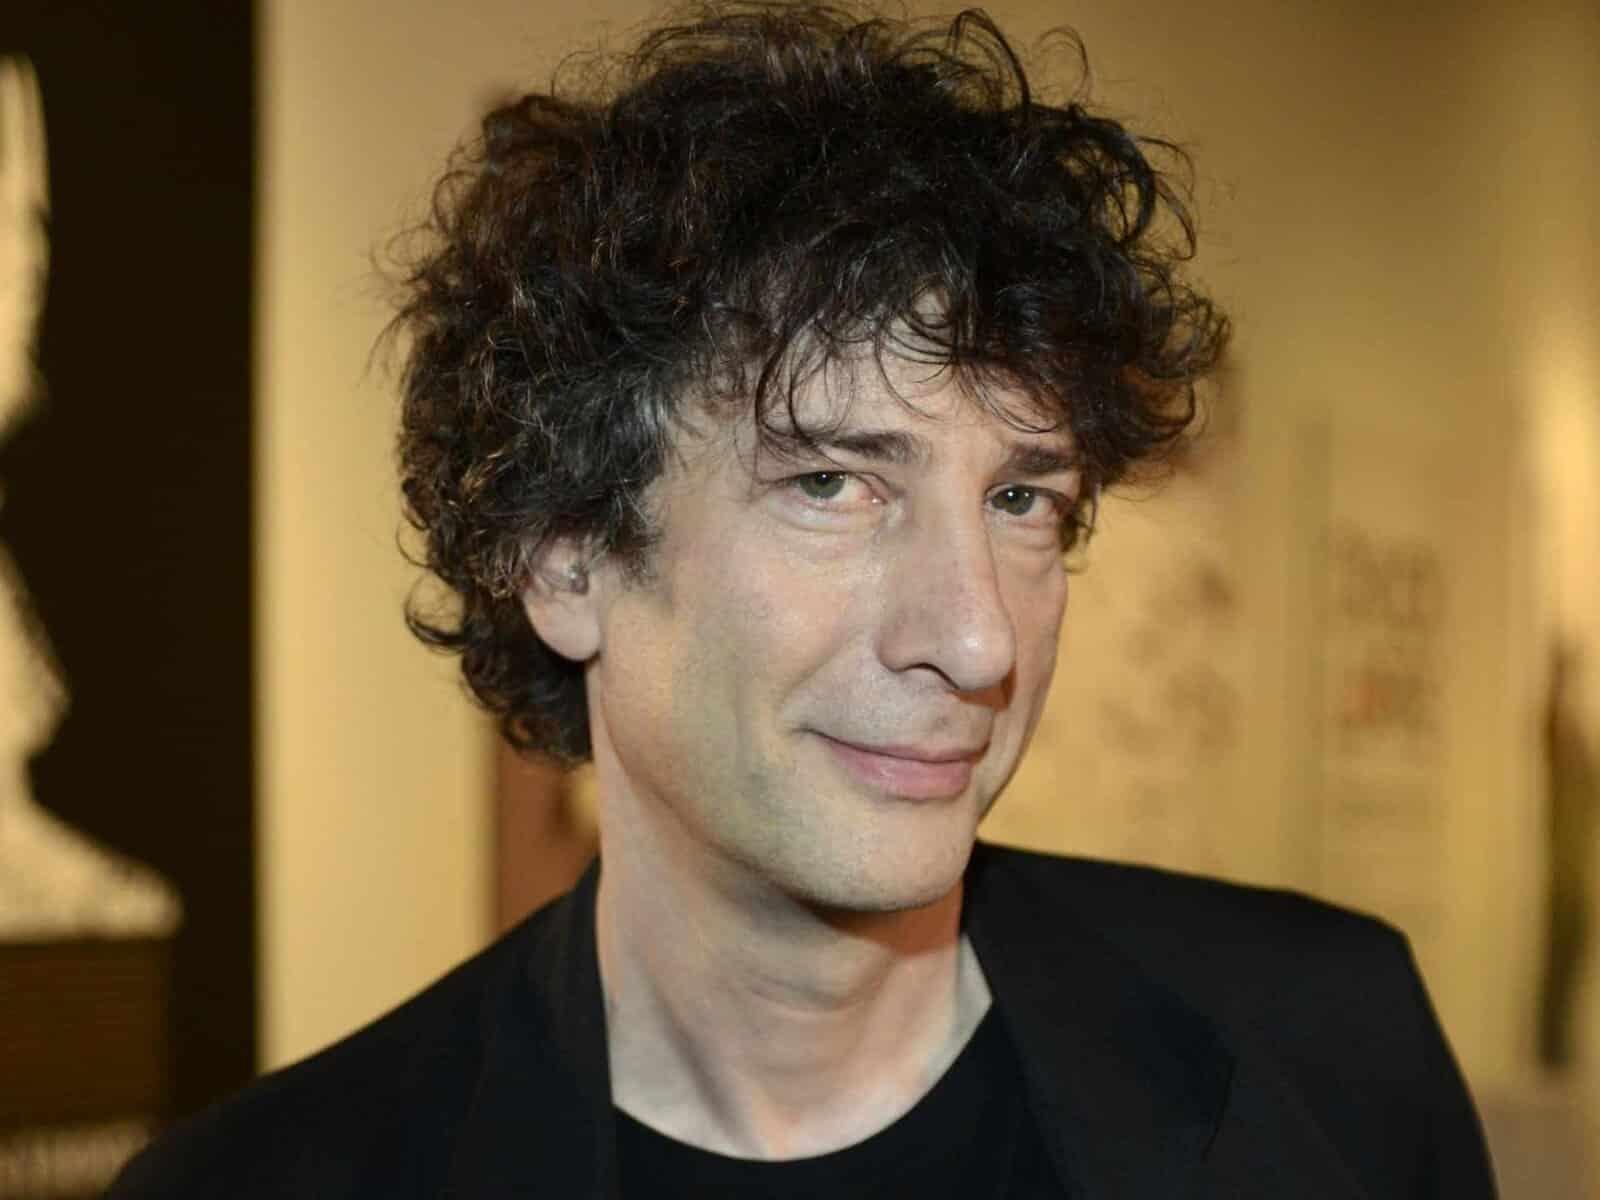 Neil Gaiman - Audiobook Author